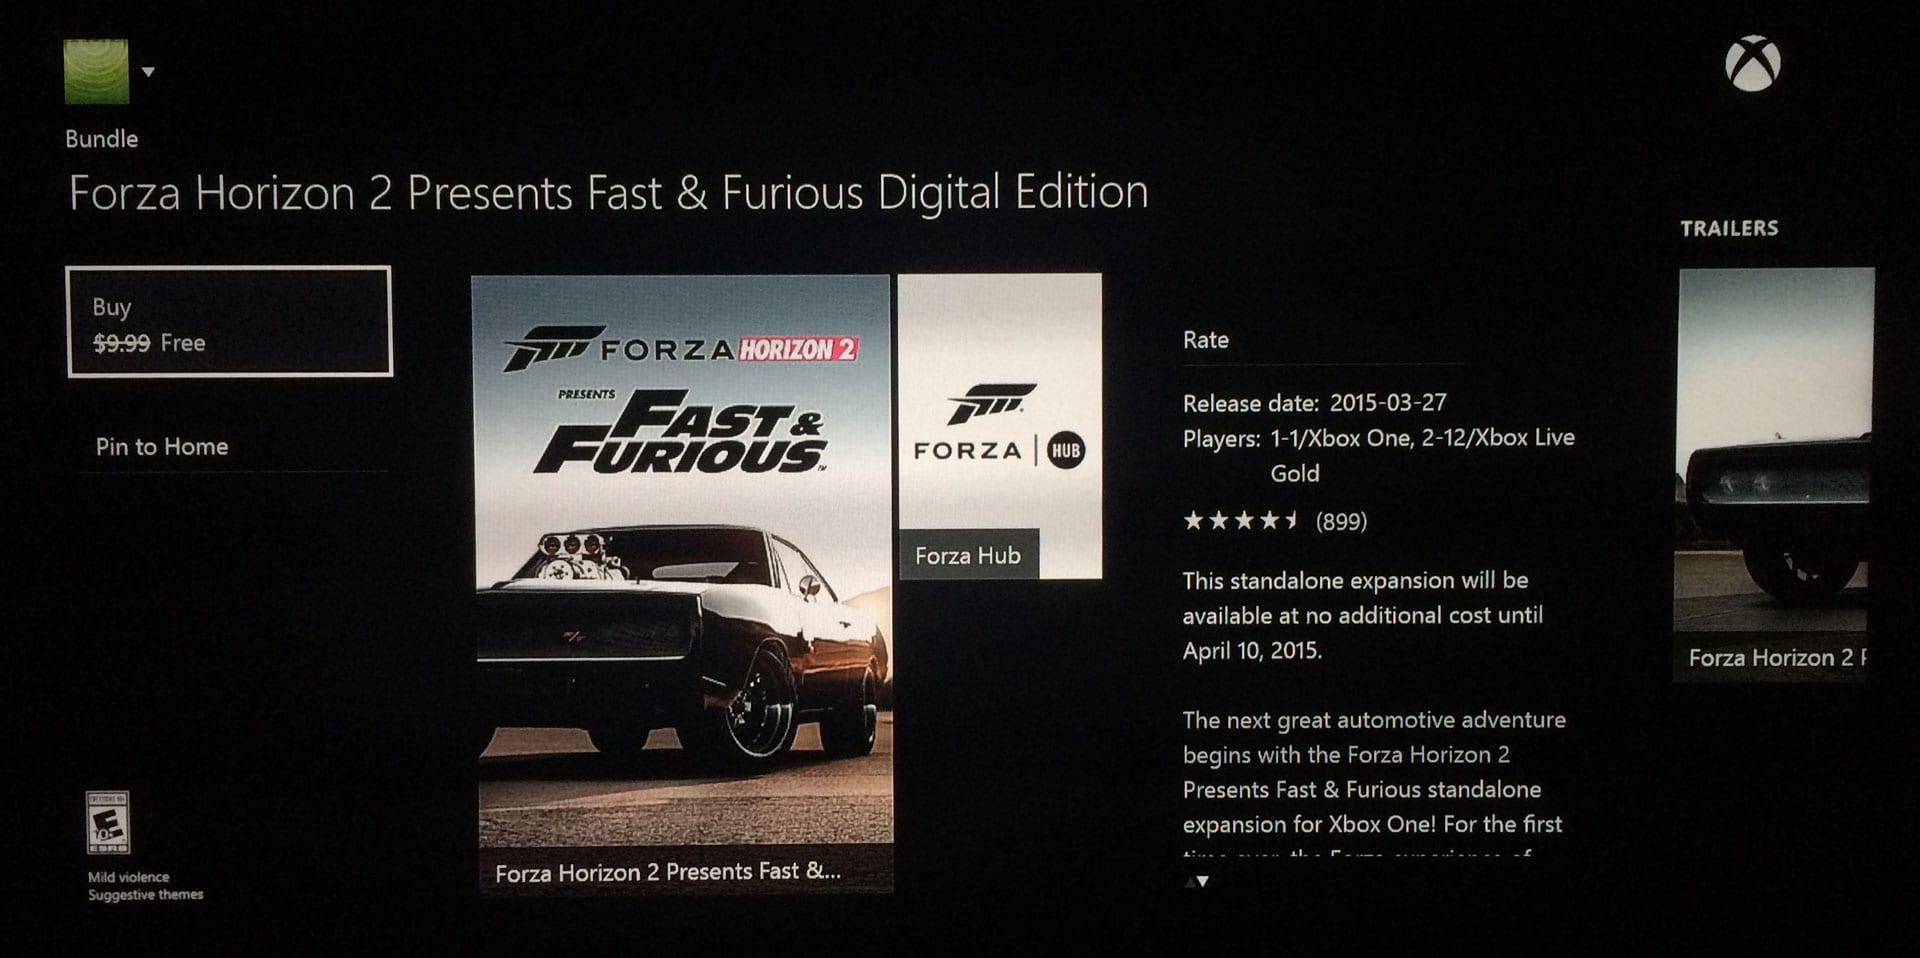 Xbox One/360 standalone Fast & Furious Forza Horizon 2 Game